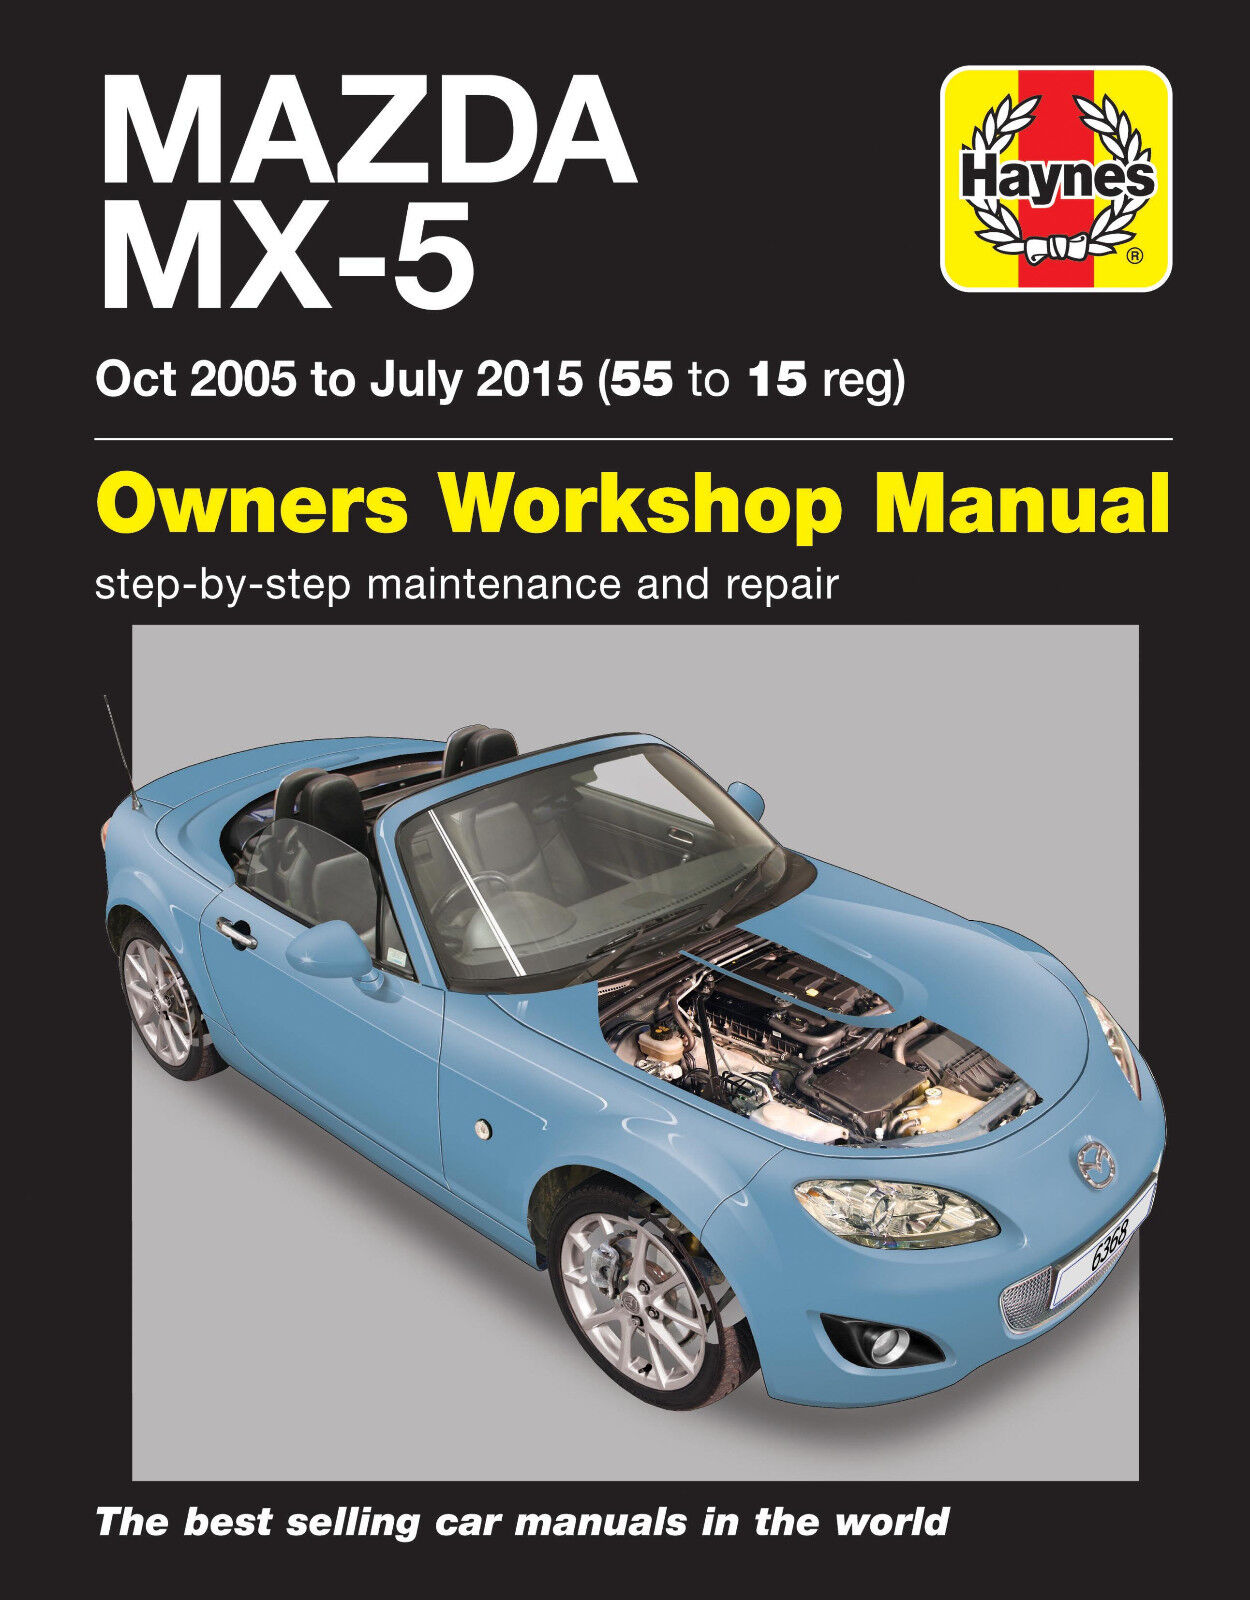 HAYNES 6368 SERVICE REPAIR MANUAL MAZDA MX-5 OCT 2005 - JULY 15 (55 - 15 REG)